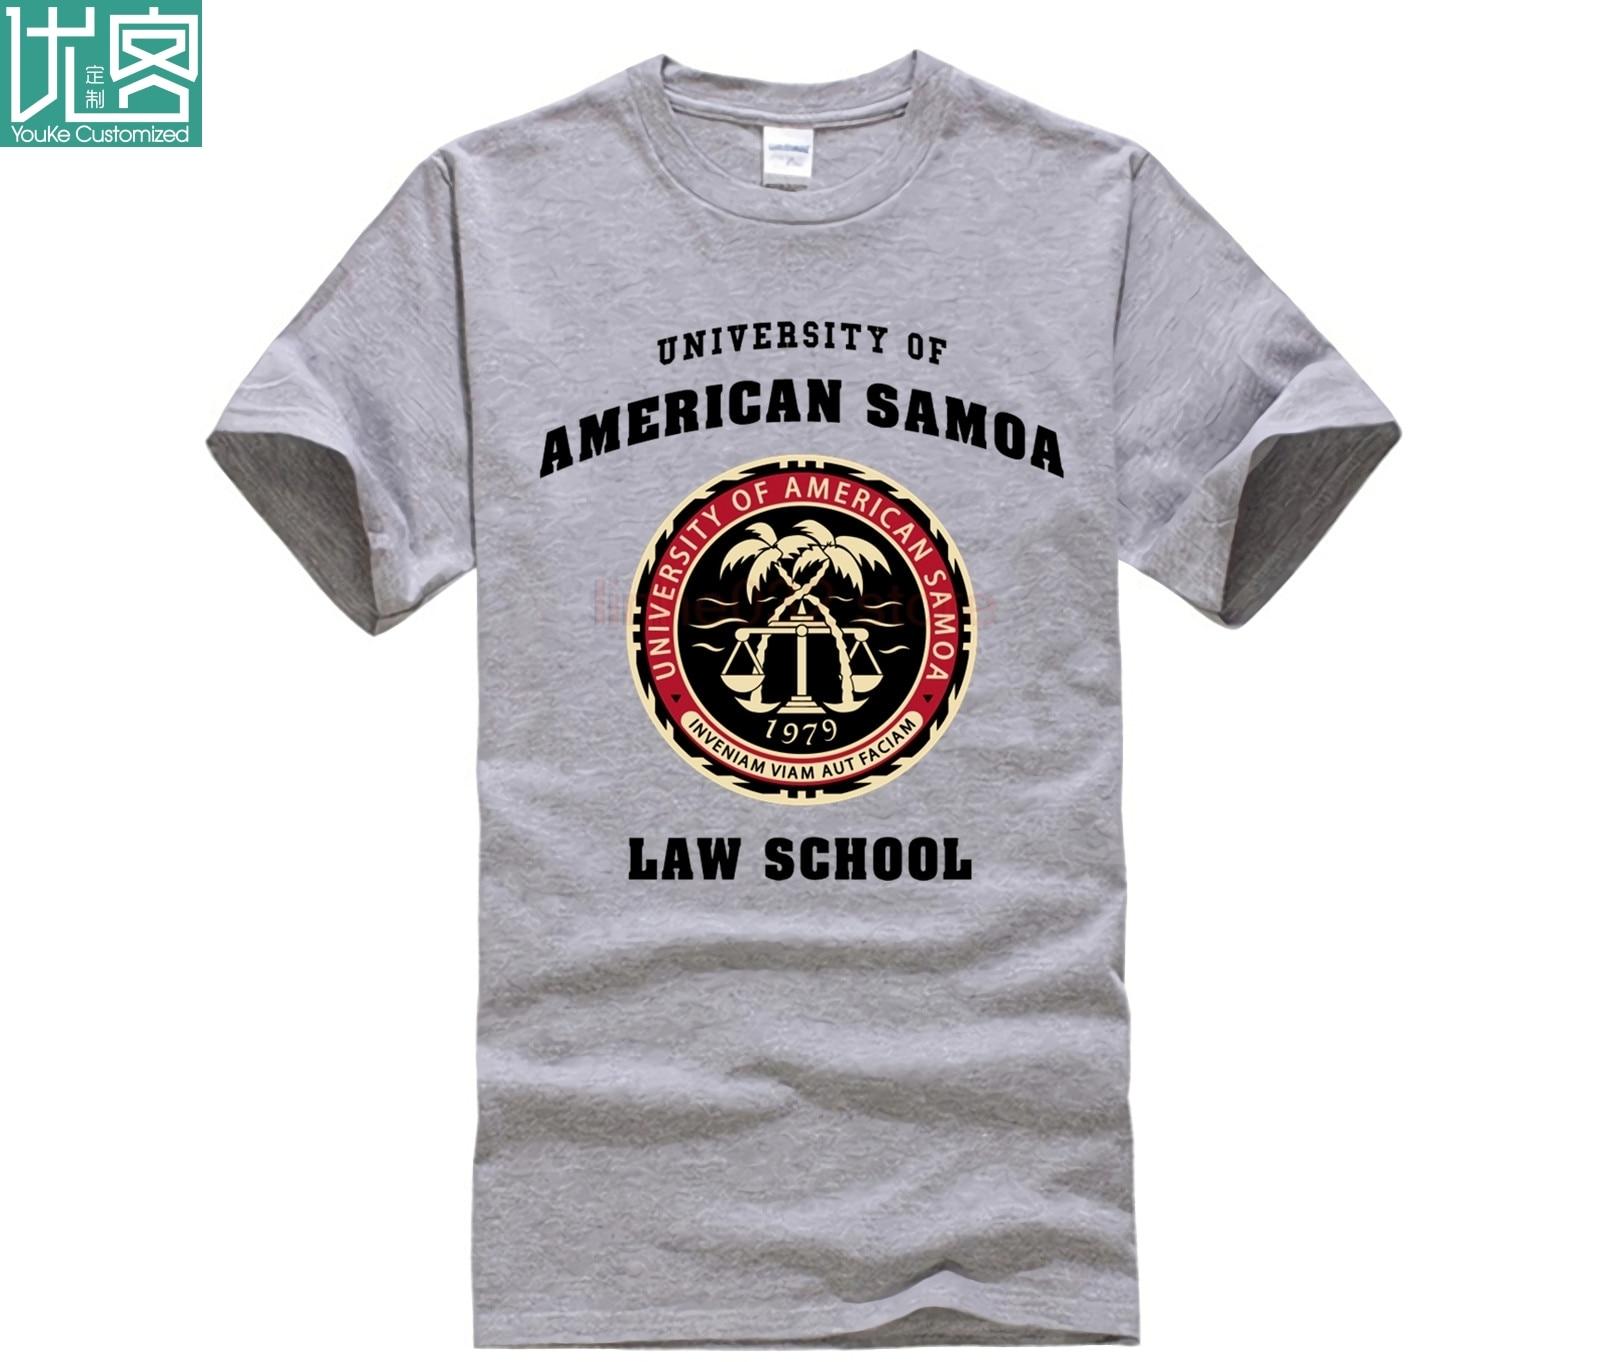 BCS - University Of American Samoa Law School T-Shirt Tops Men's O-shirts